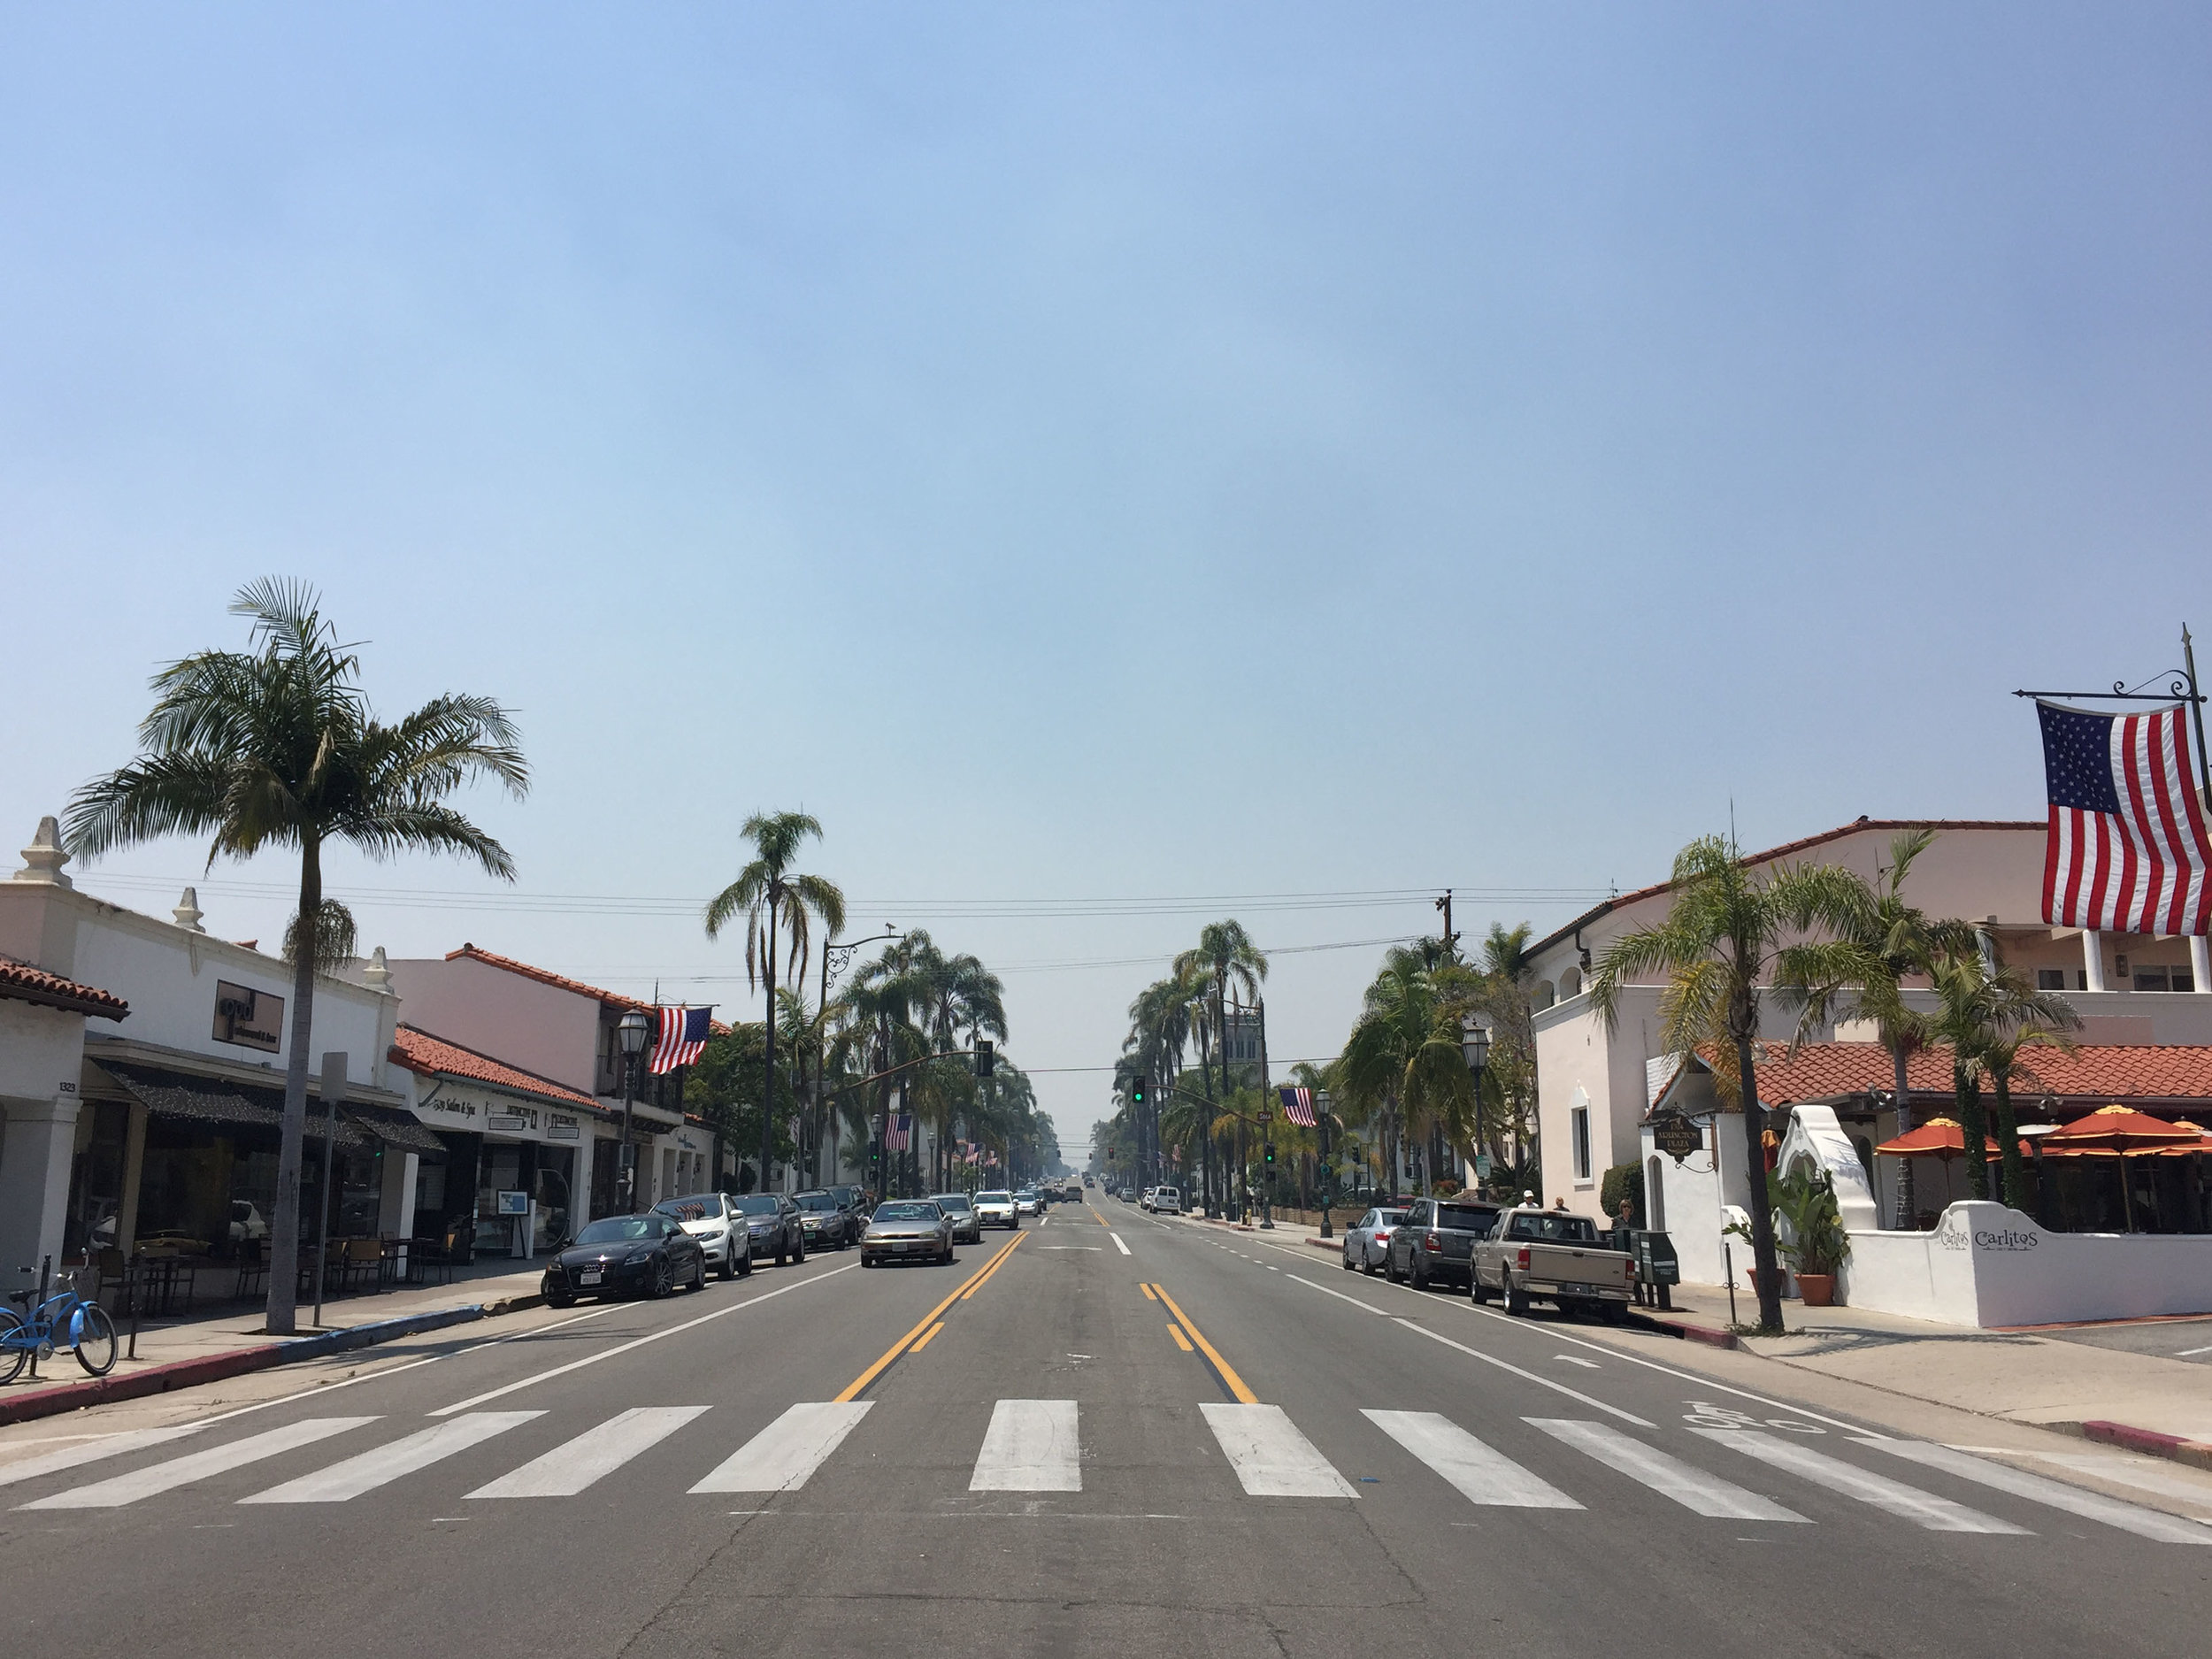 'State Street'Santa Barbara, California, 2016.